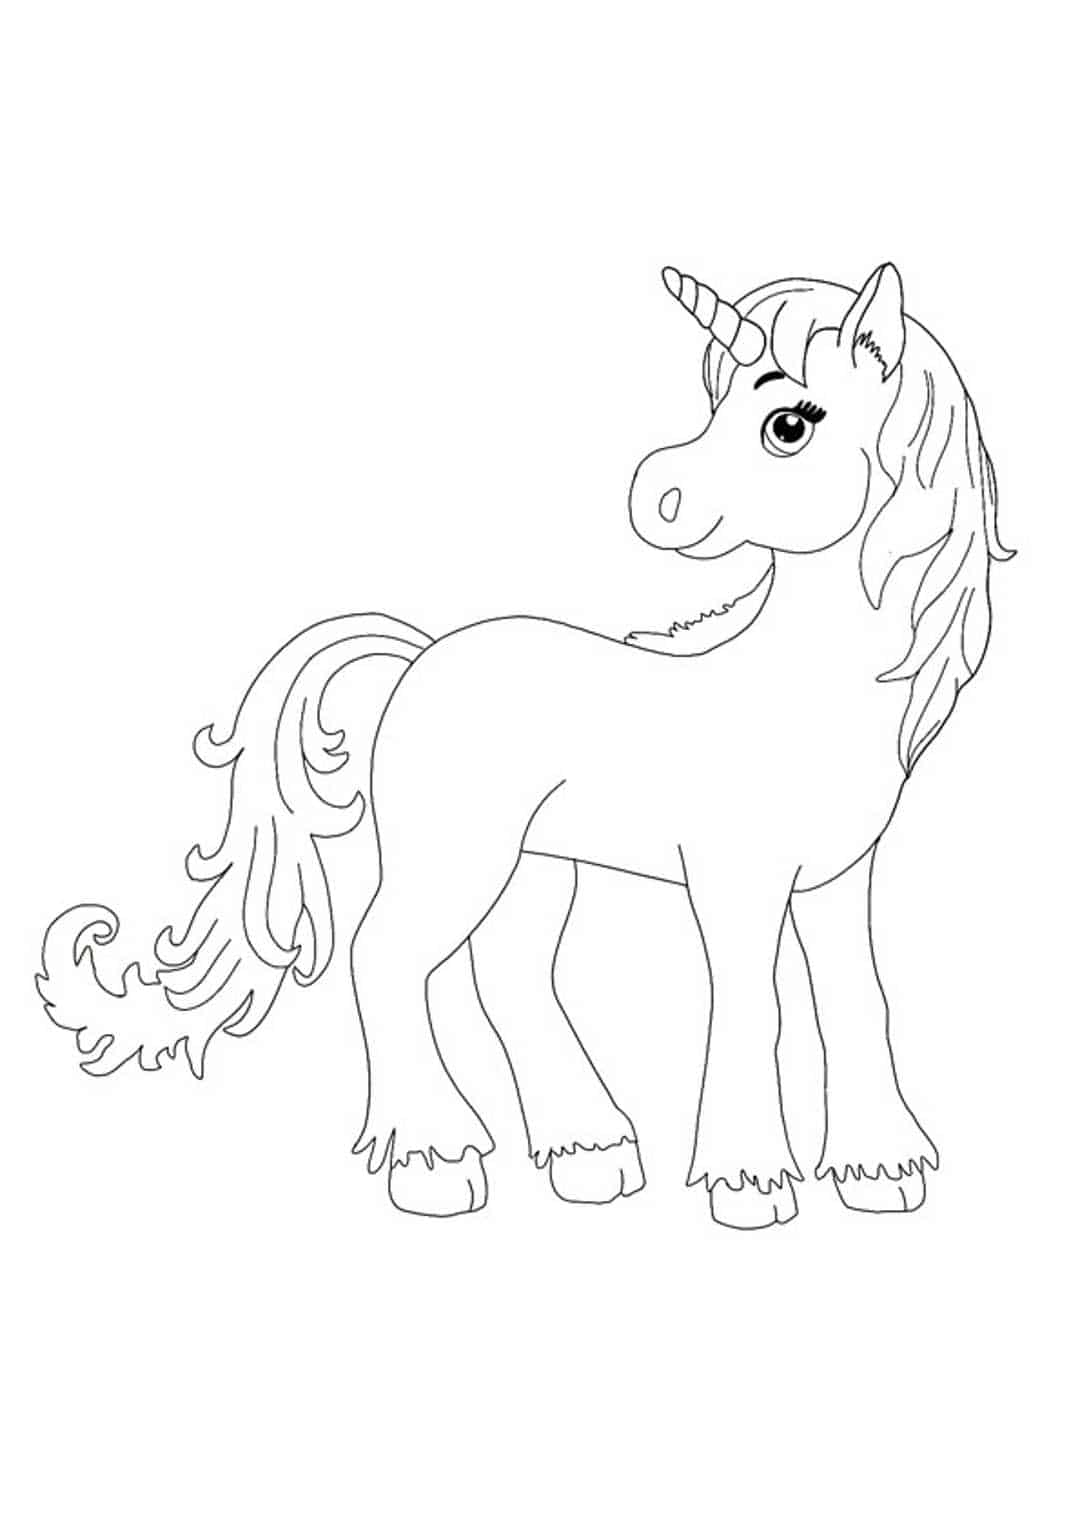 Cute little unicorn coloring page